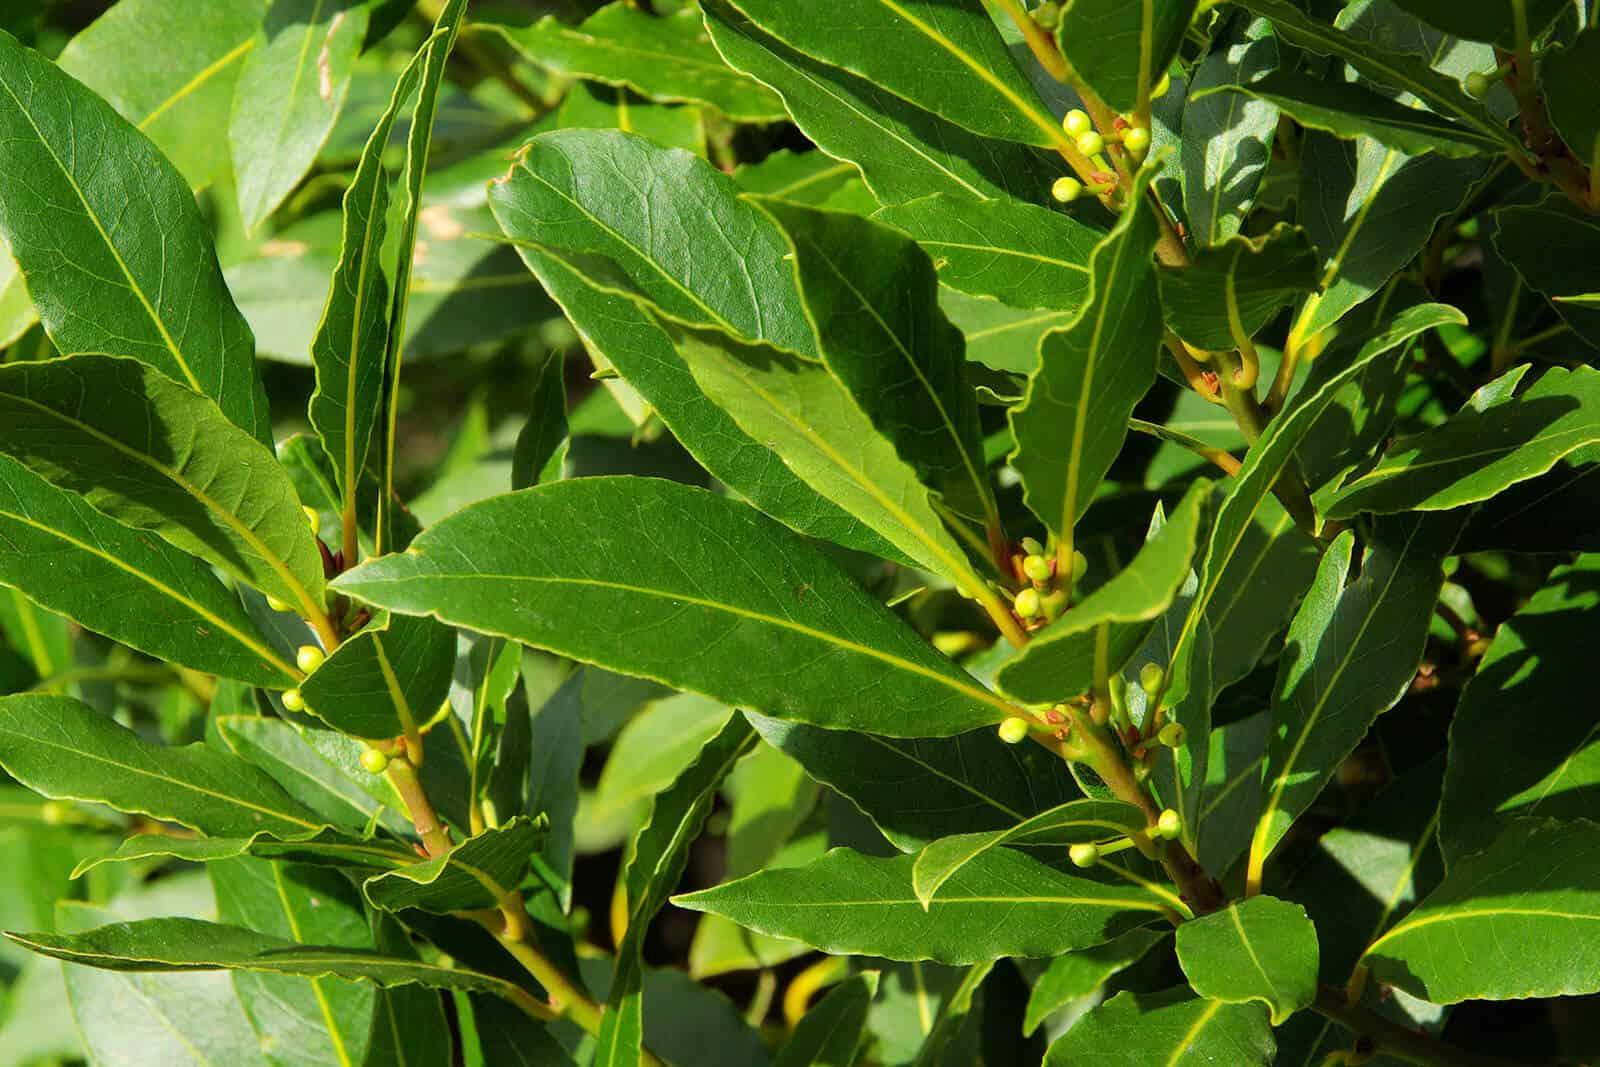 wellnessaromas-aromatherapy-essential-oil_bay-laurel-benefits-uses